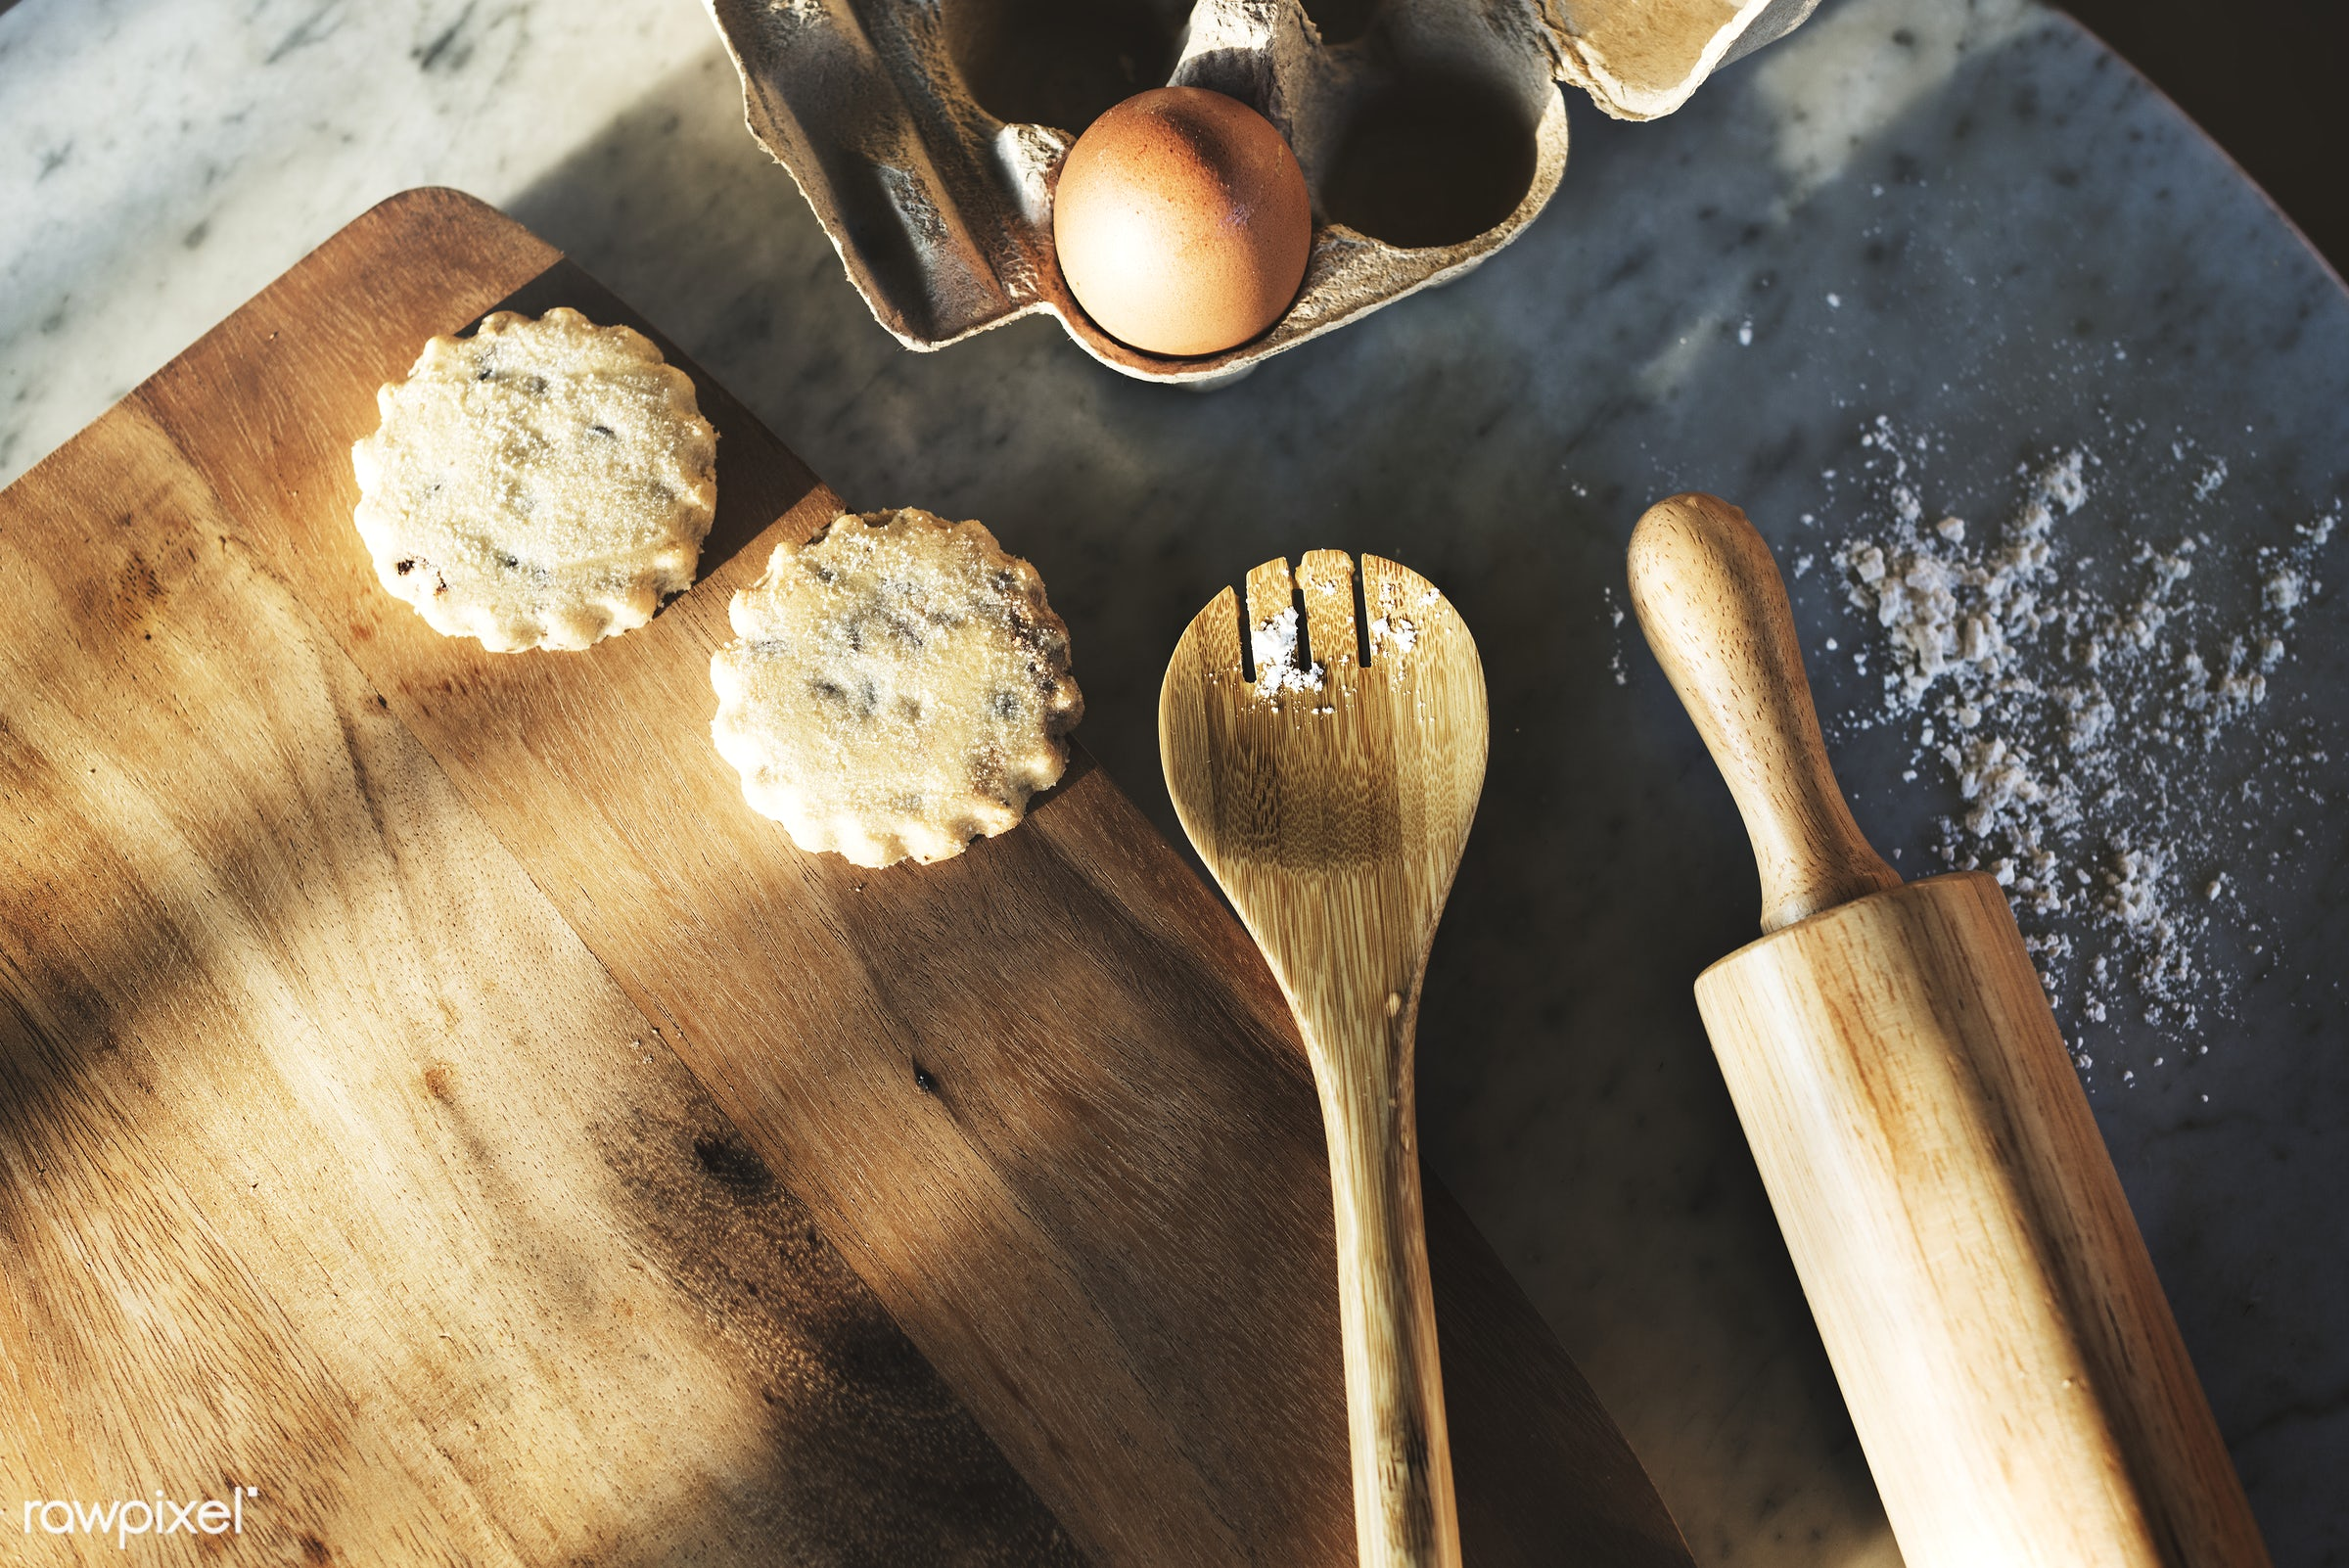 bake, baker, bakery, baking, biscuit, cookies, cooking, dessert, egg, equipment, flour, food, gourmet, homemade, ingredients...